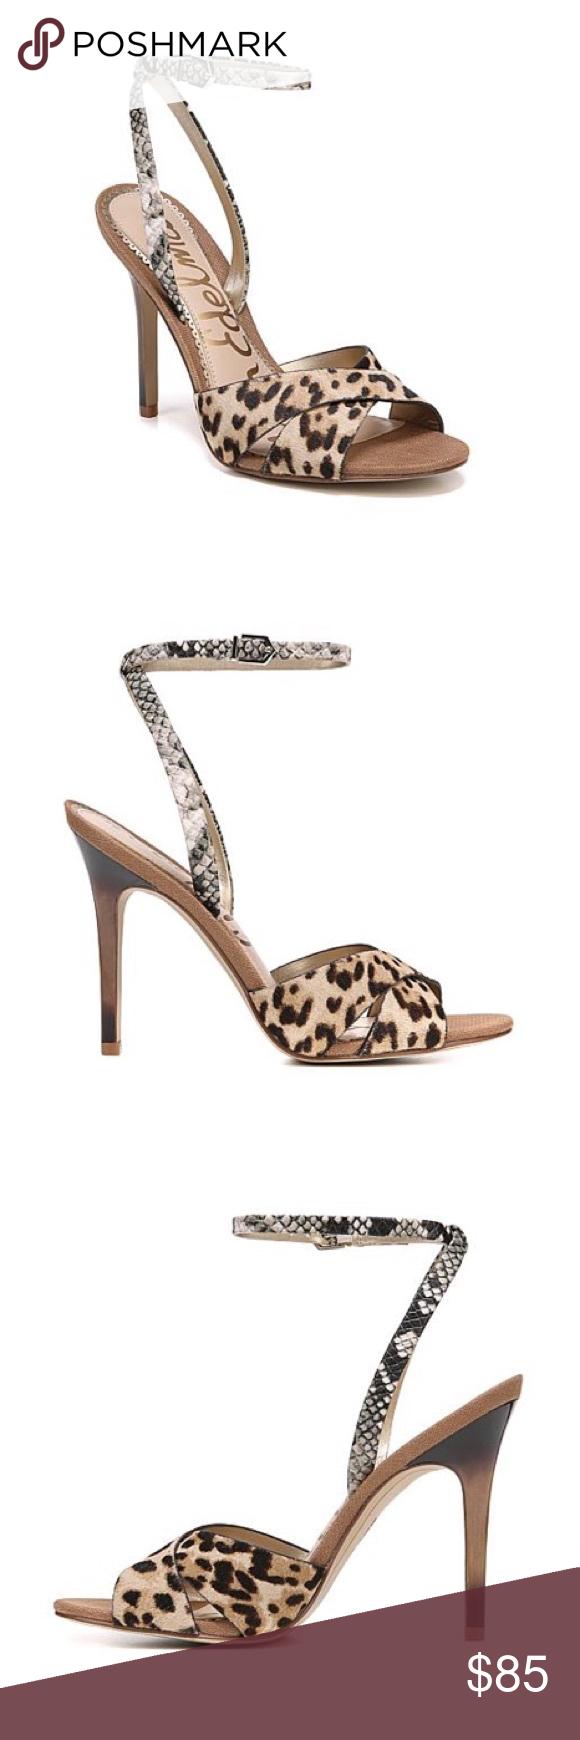 Sam Edelman 'Aly' Leopard print Heels